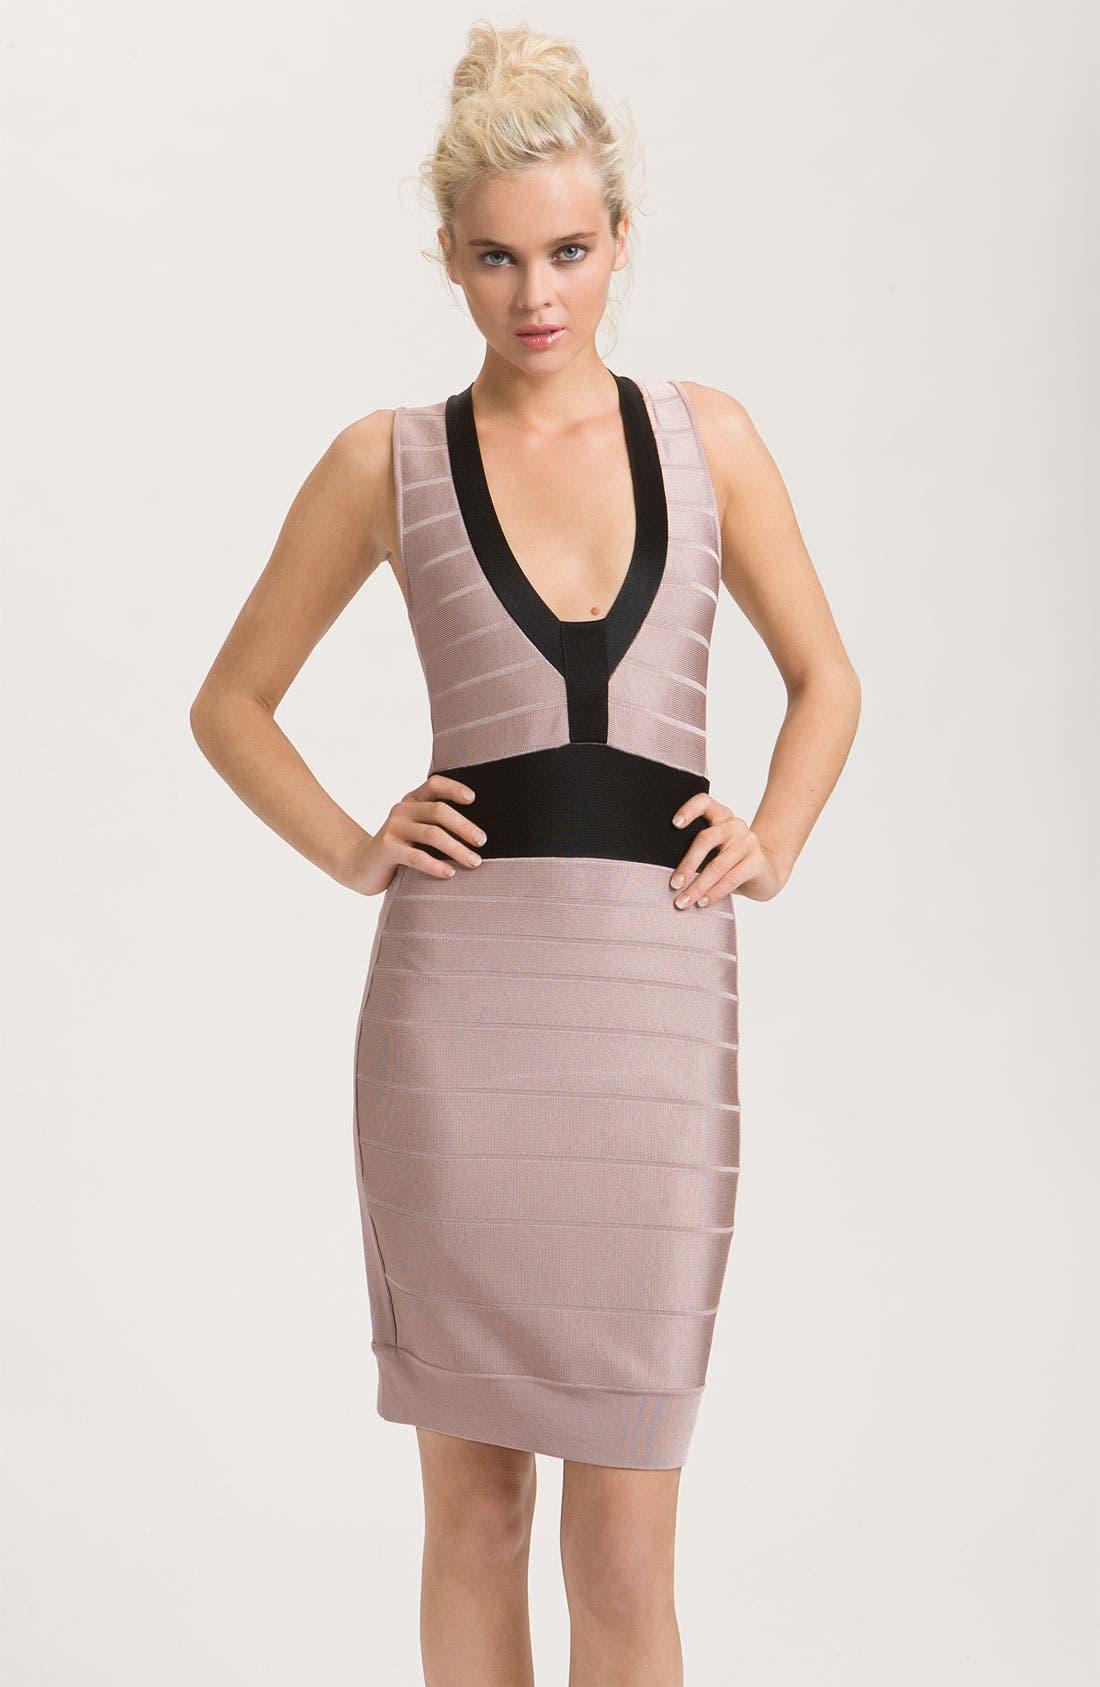 Main Image - French Connection 'Ribbon Knits' Banded Dress